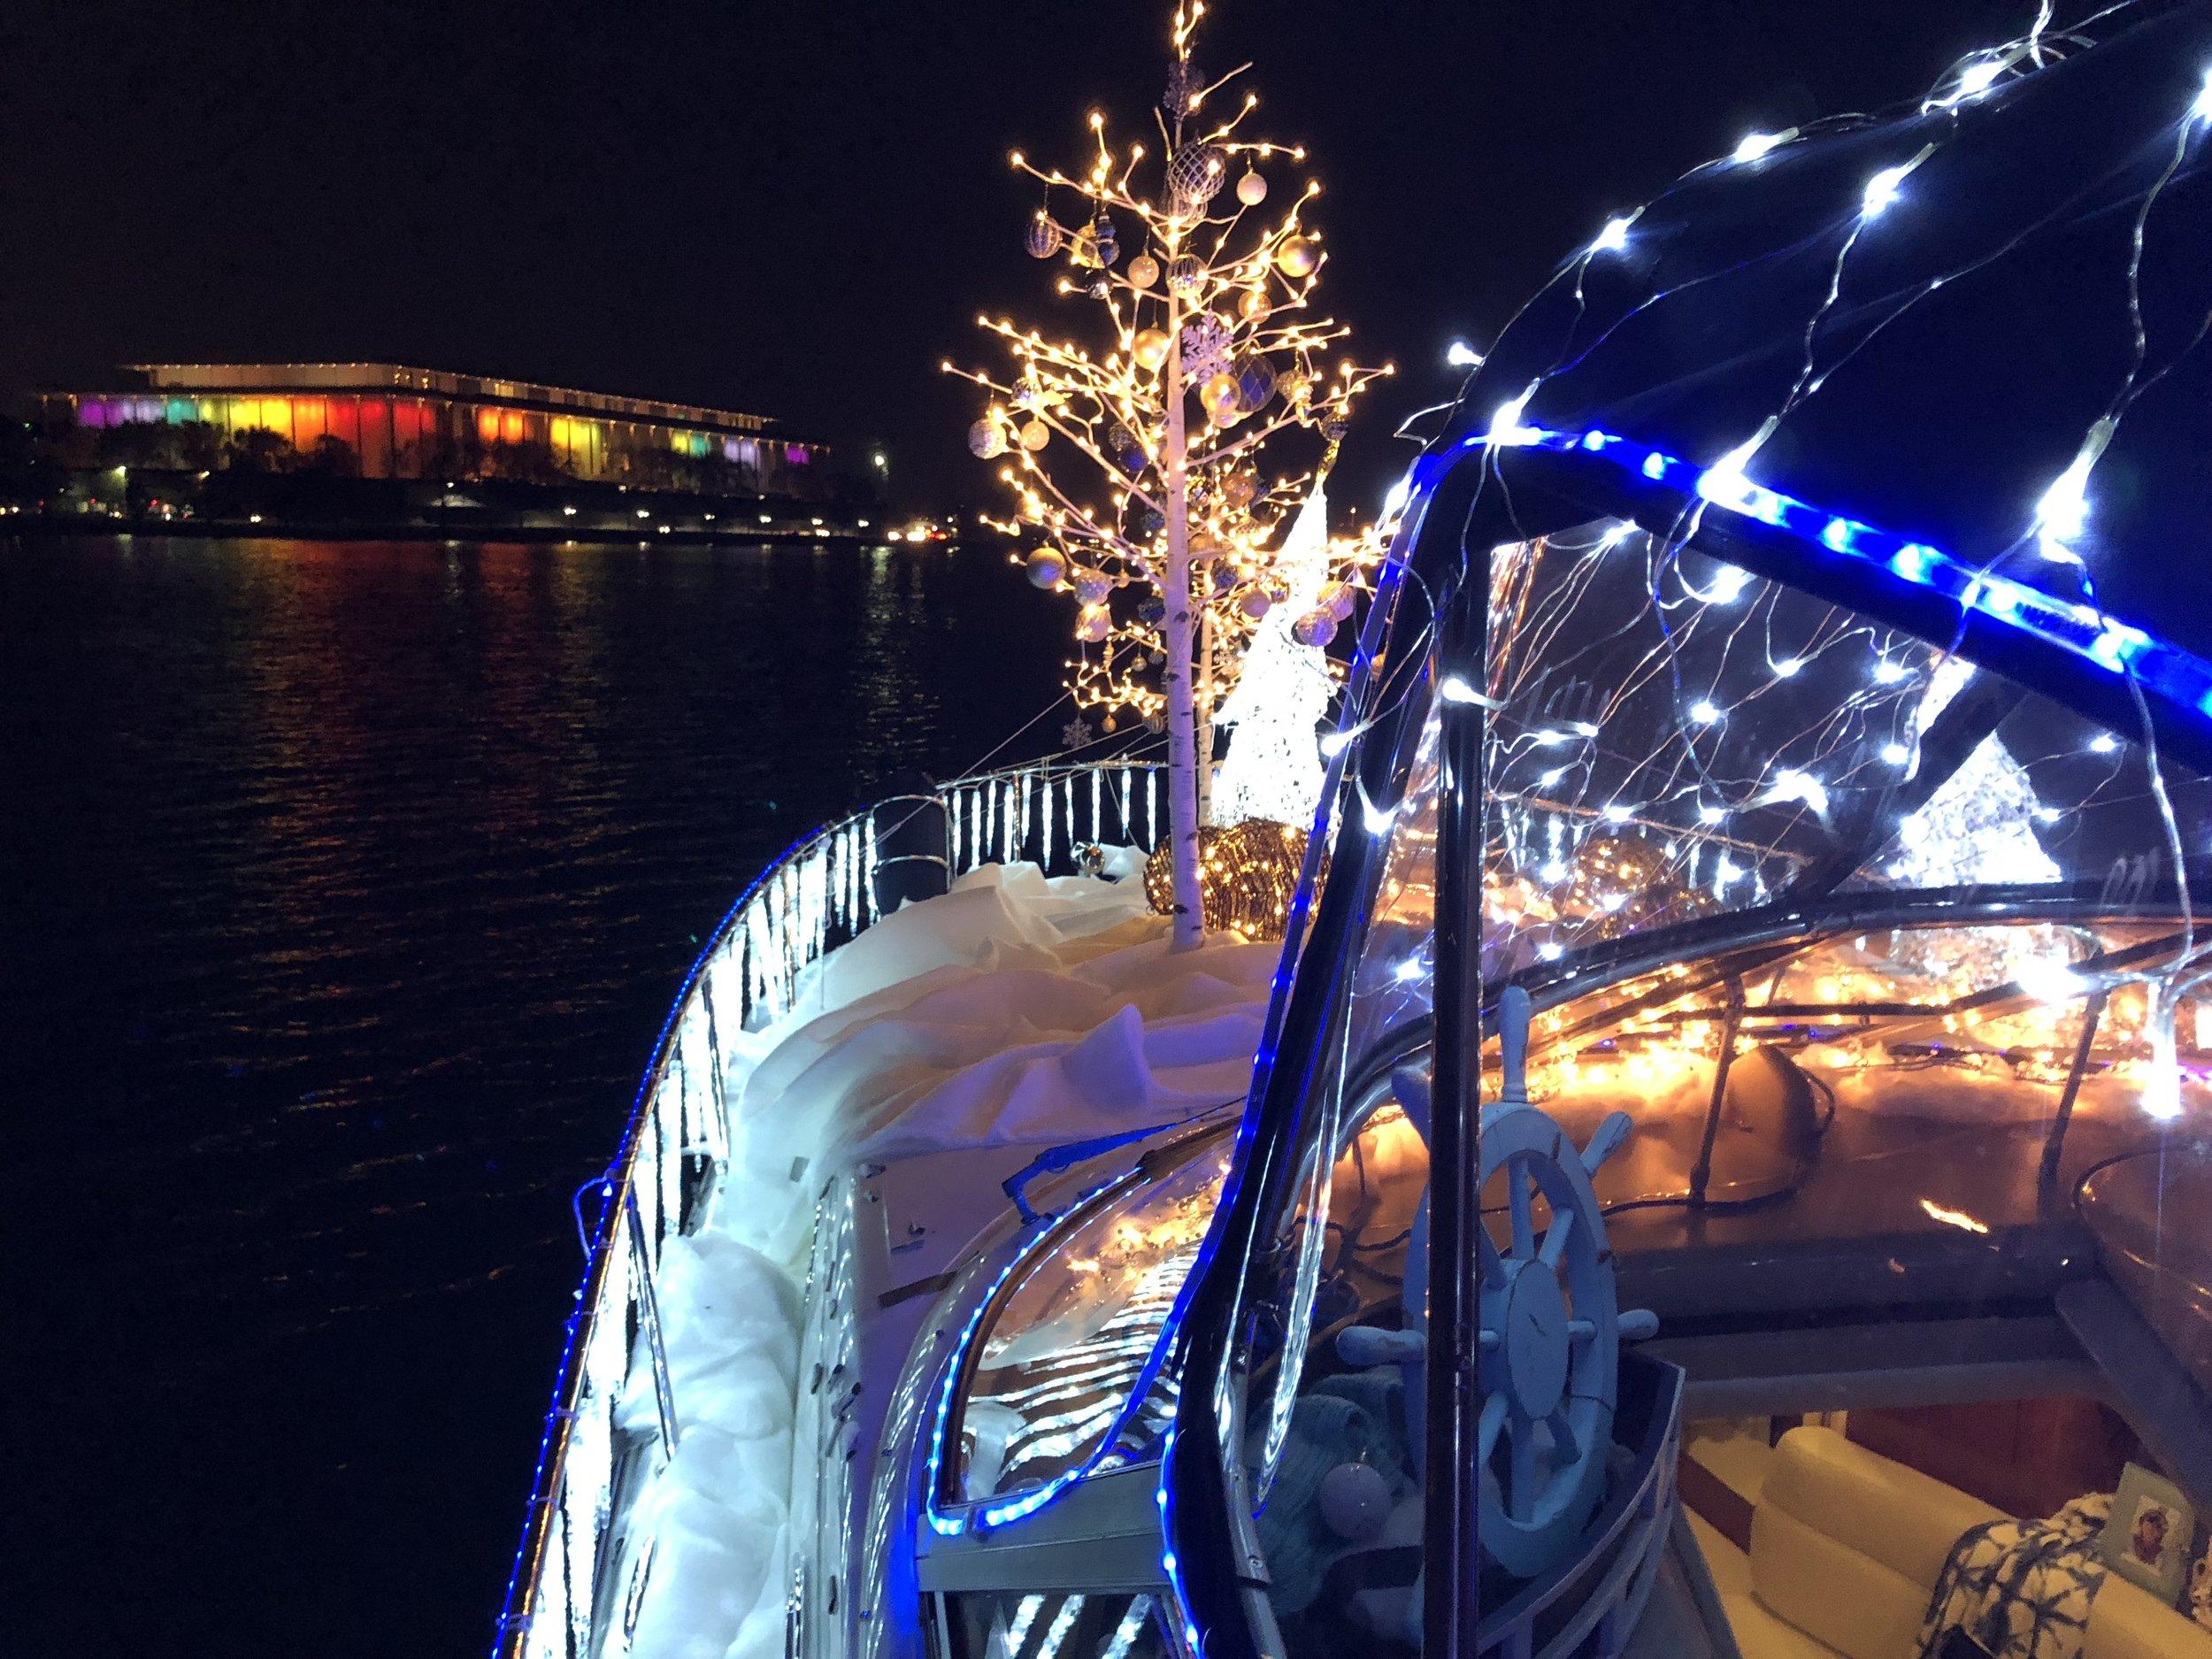 Savvy_Sexy_socia_womens_Networking_club_Keula_Binelly_Boating_life_washington-dc_Light_Parade_Holiday_Wharf